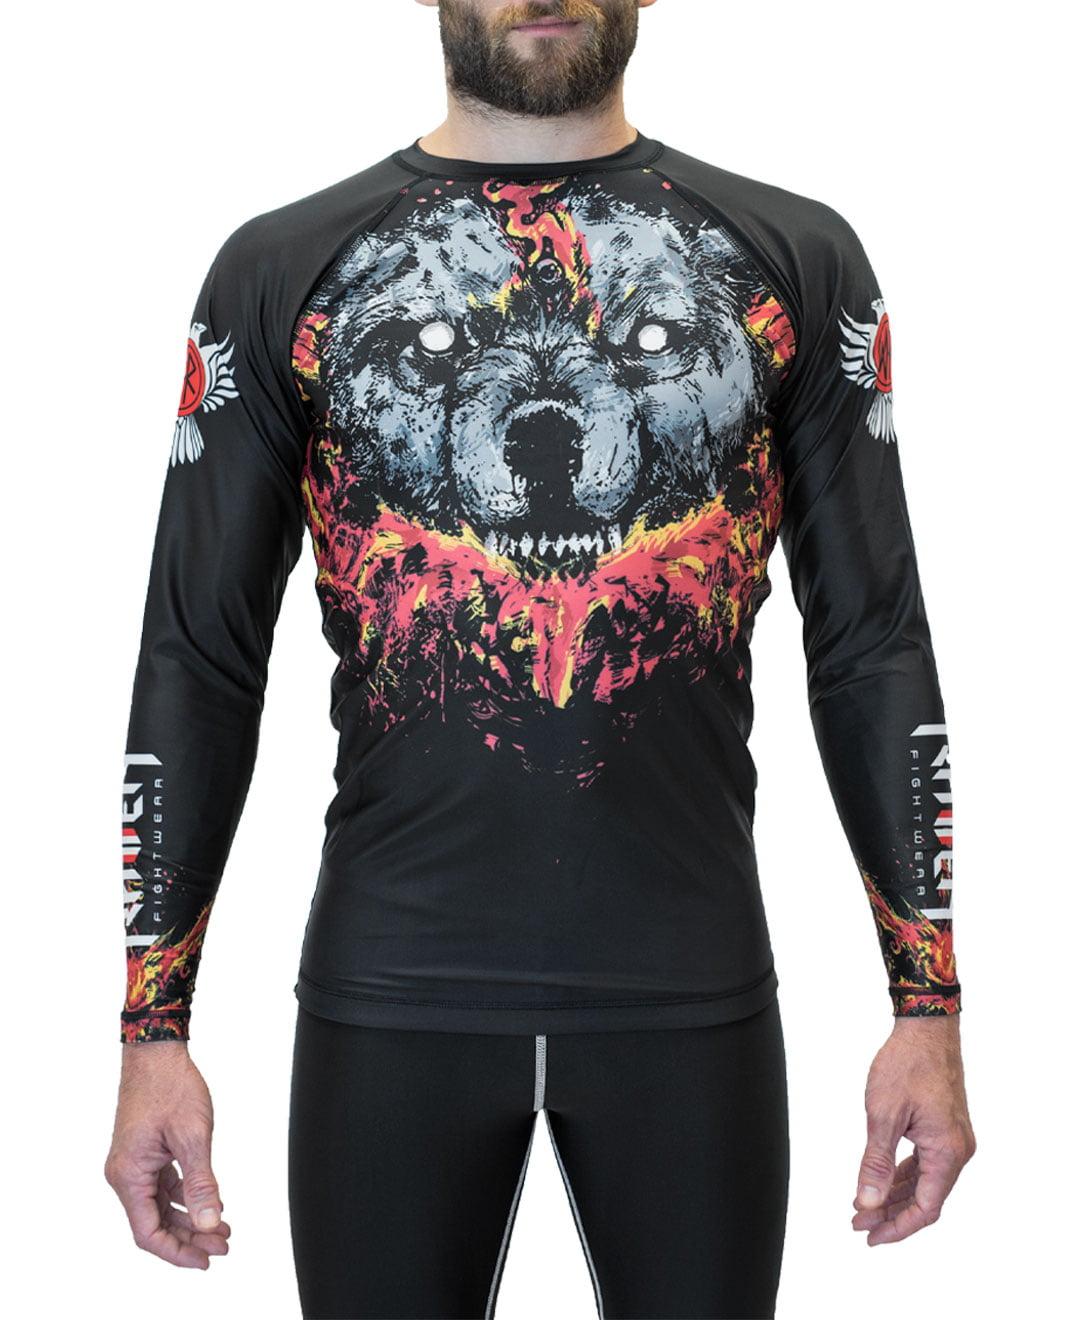 Raven Fightwear Men's Cerberus MMA BJJ Rash Guard Black 2X-Large